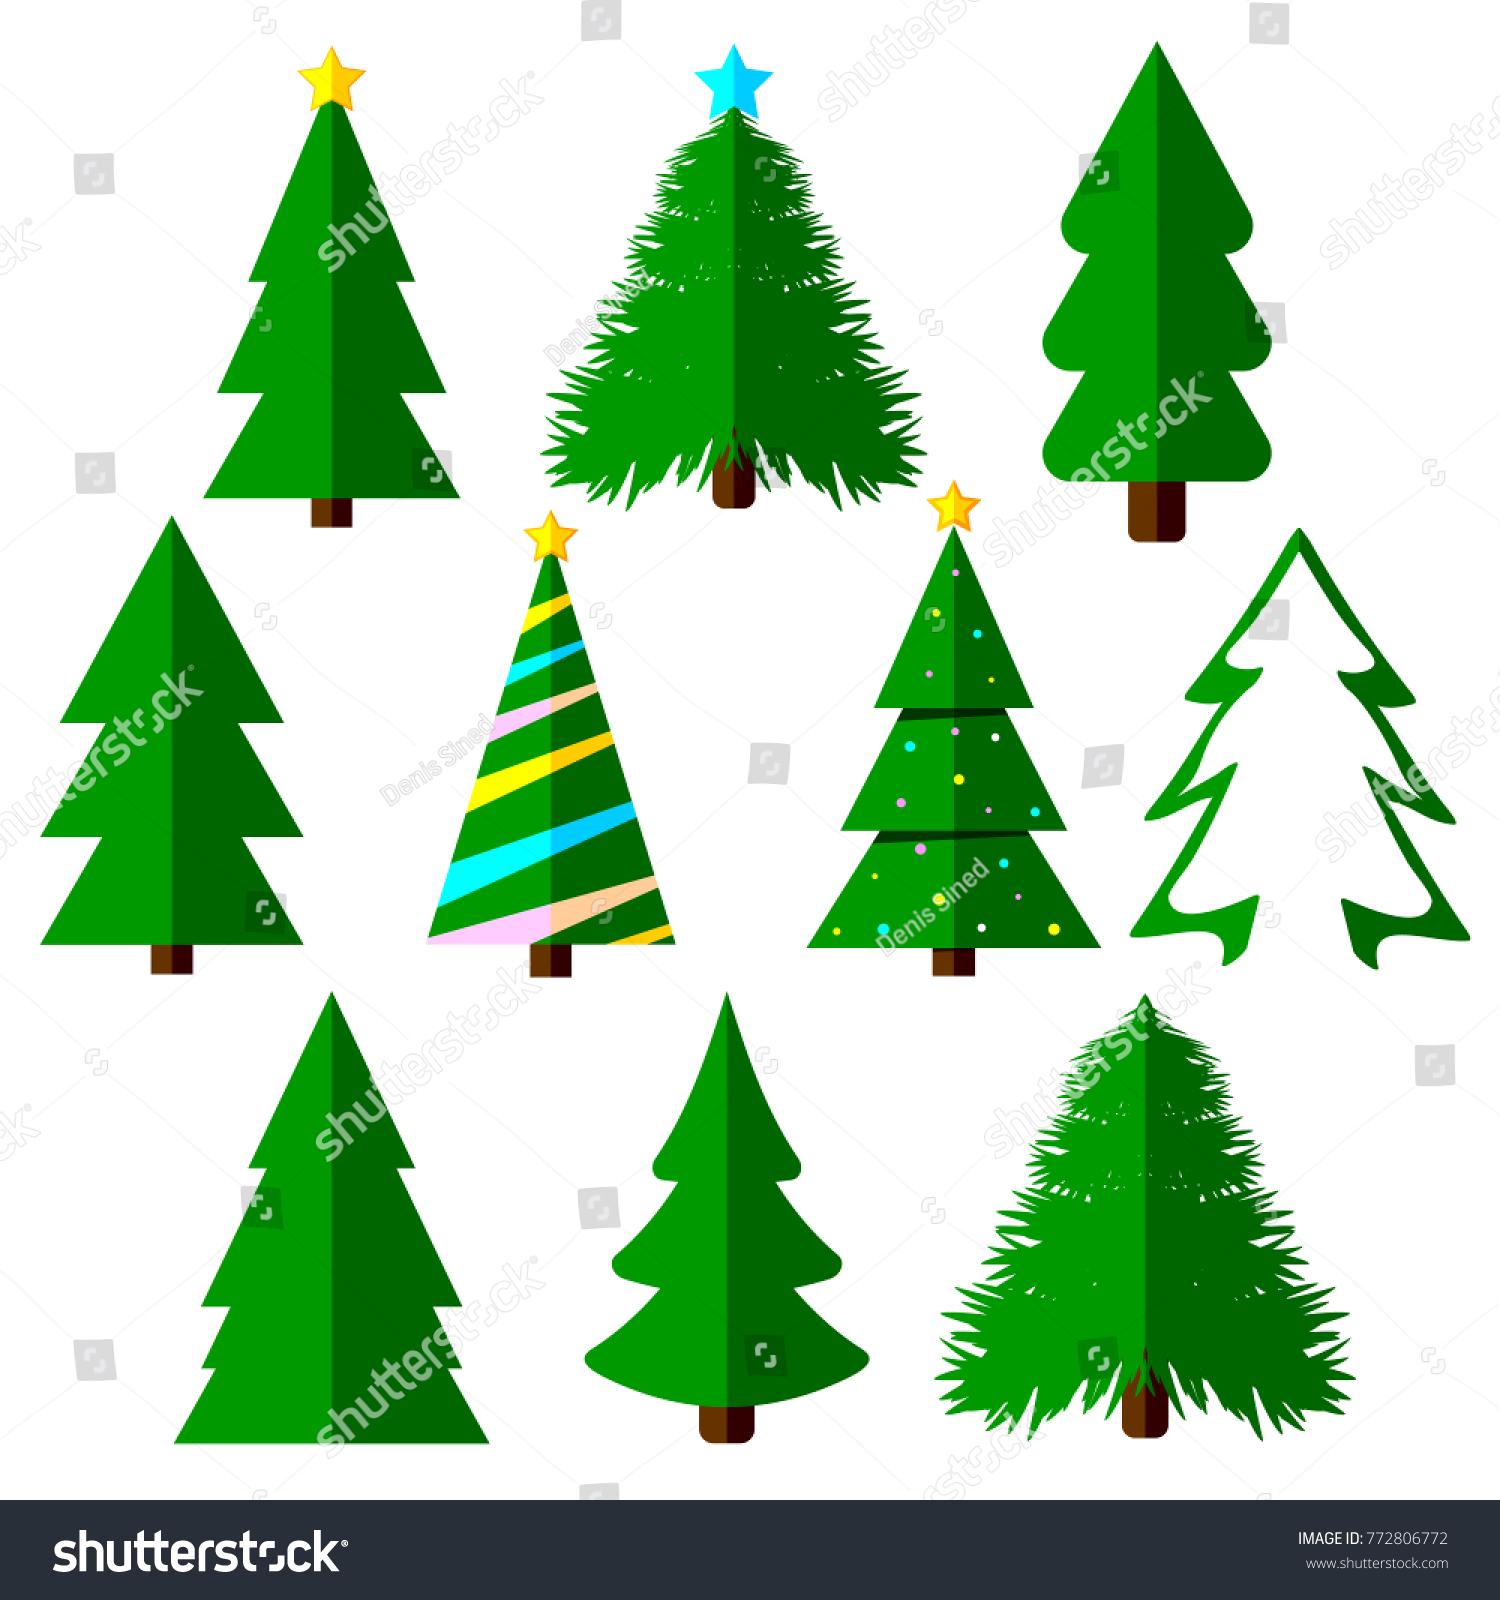 Set xmas tree icons christmas symbols stock vector 772806772 set xmas tree icons christmas symbols flat design template vector illustration biocorpaavc